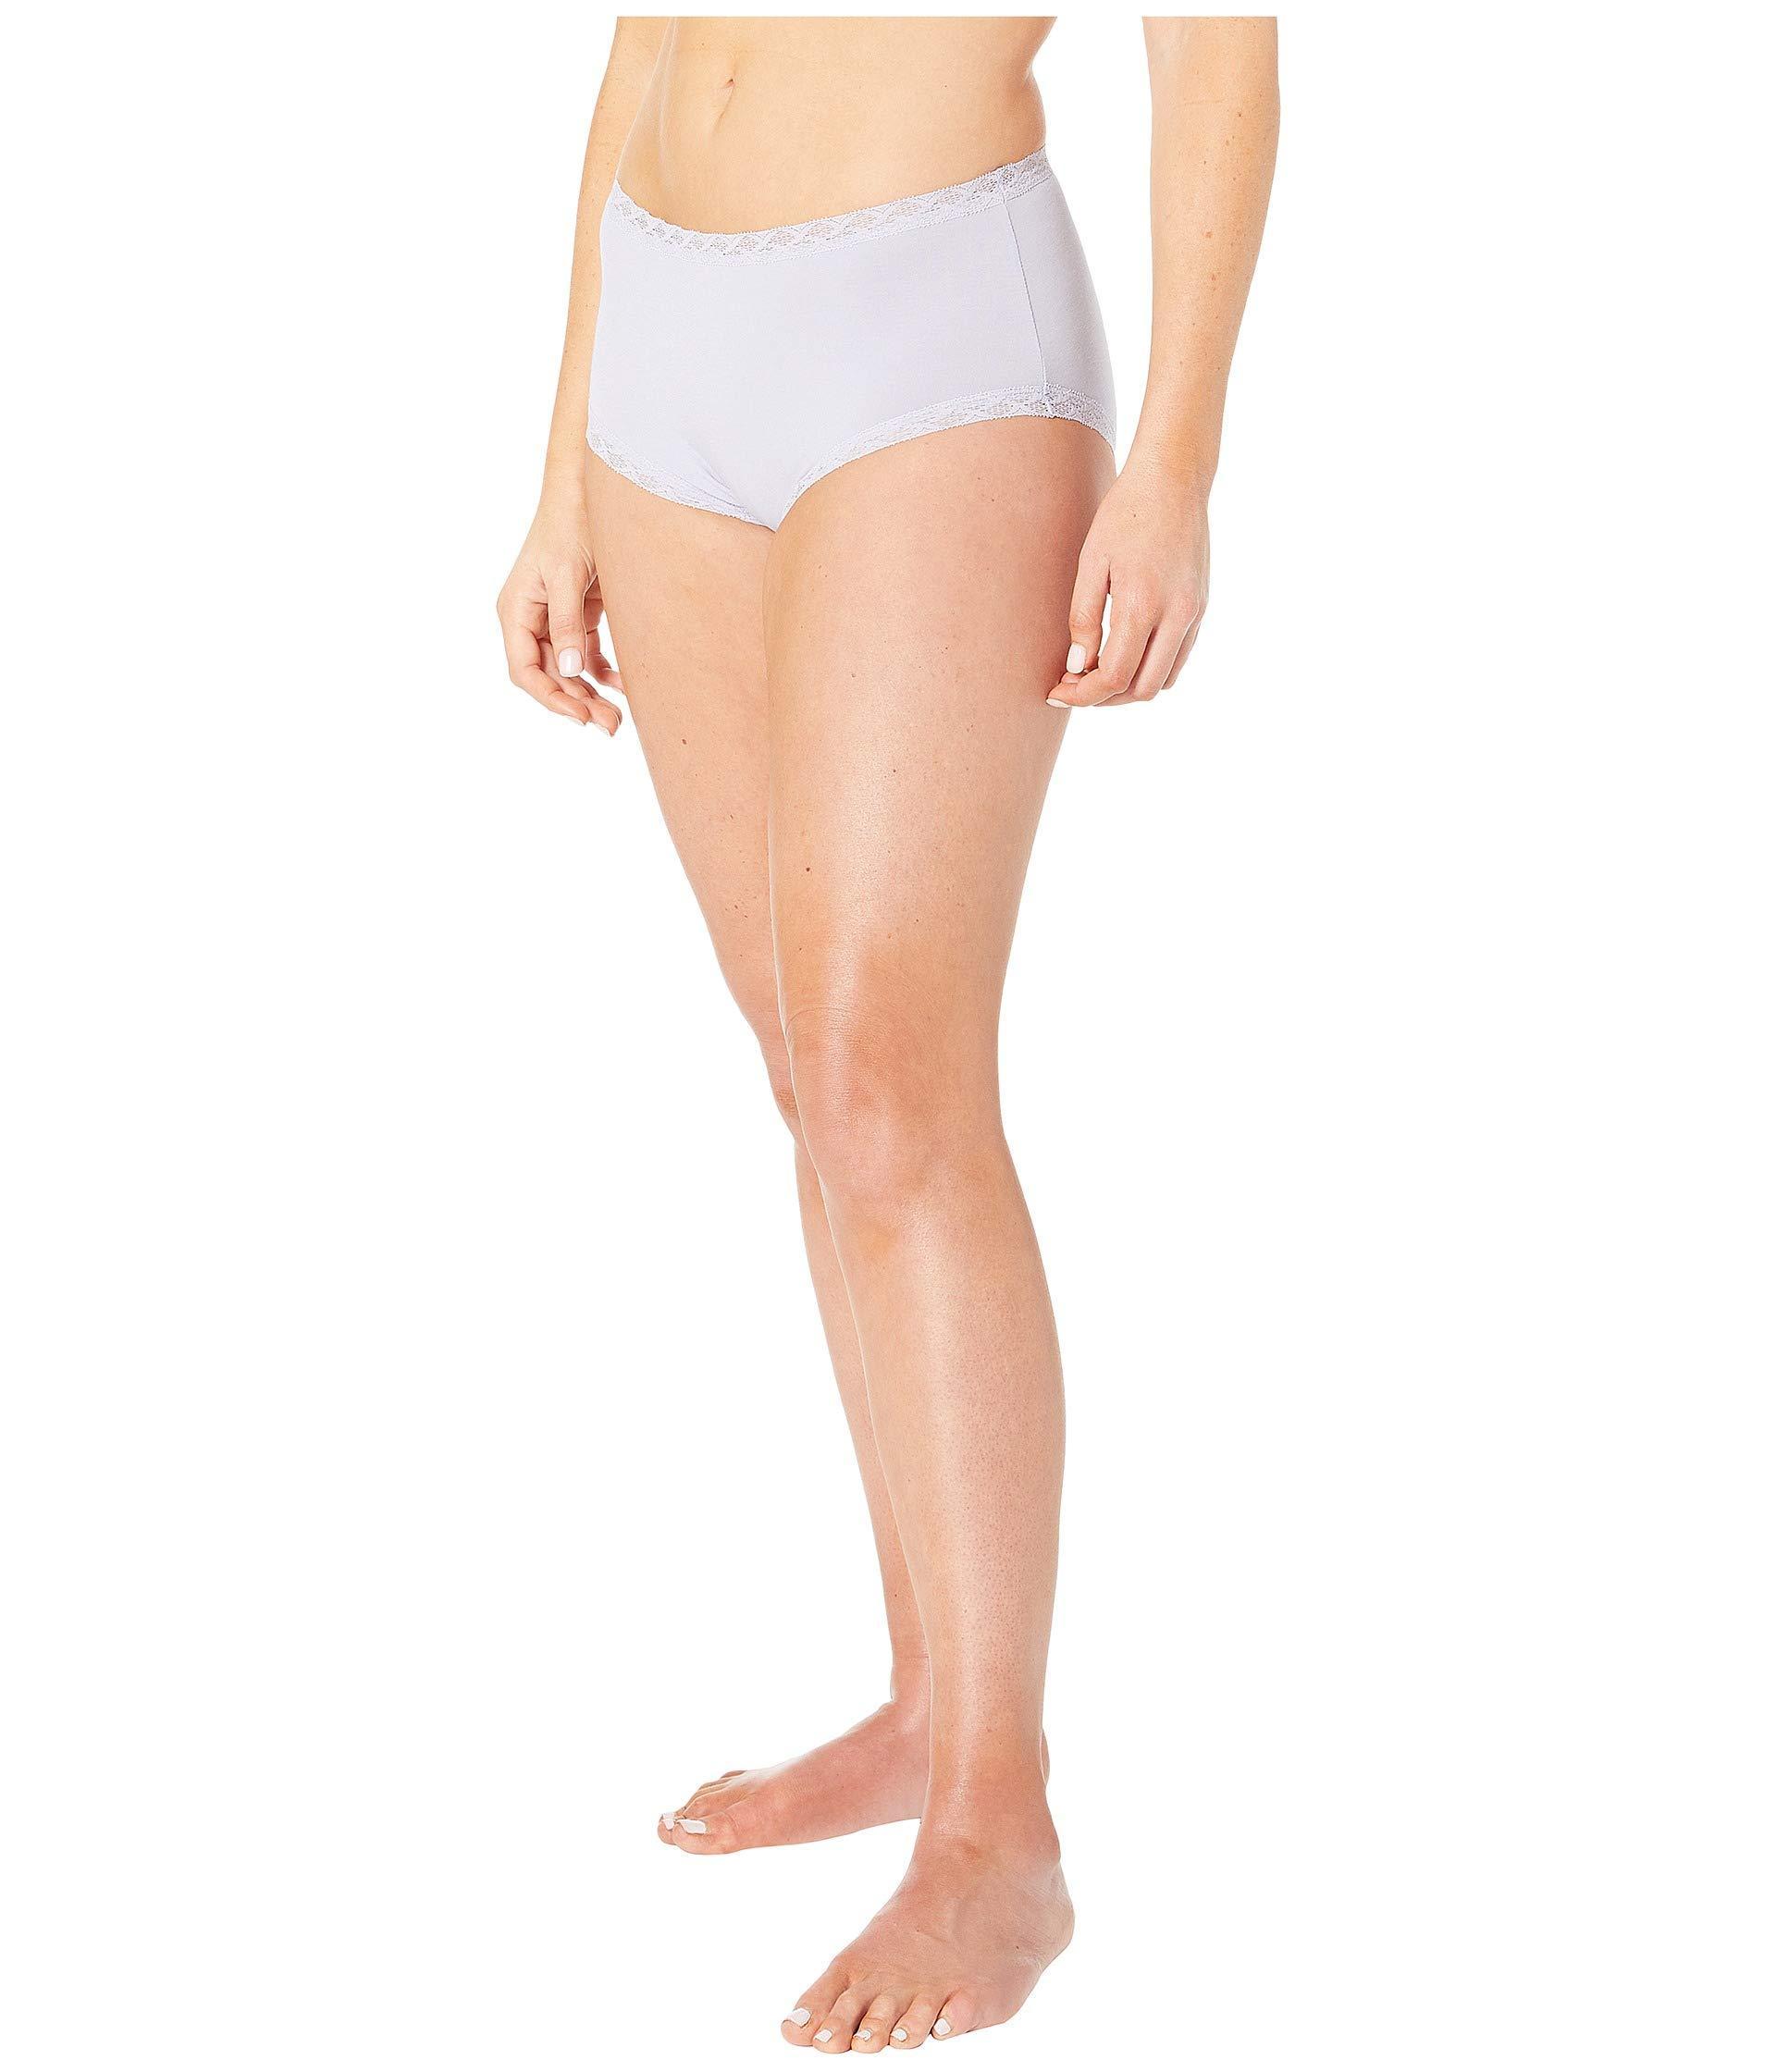 d44ab7753fb1 Natori - Bliss Cotton Full Brief (blushing Pink) Women's Underwear - Lyst.  View fullscreen